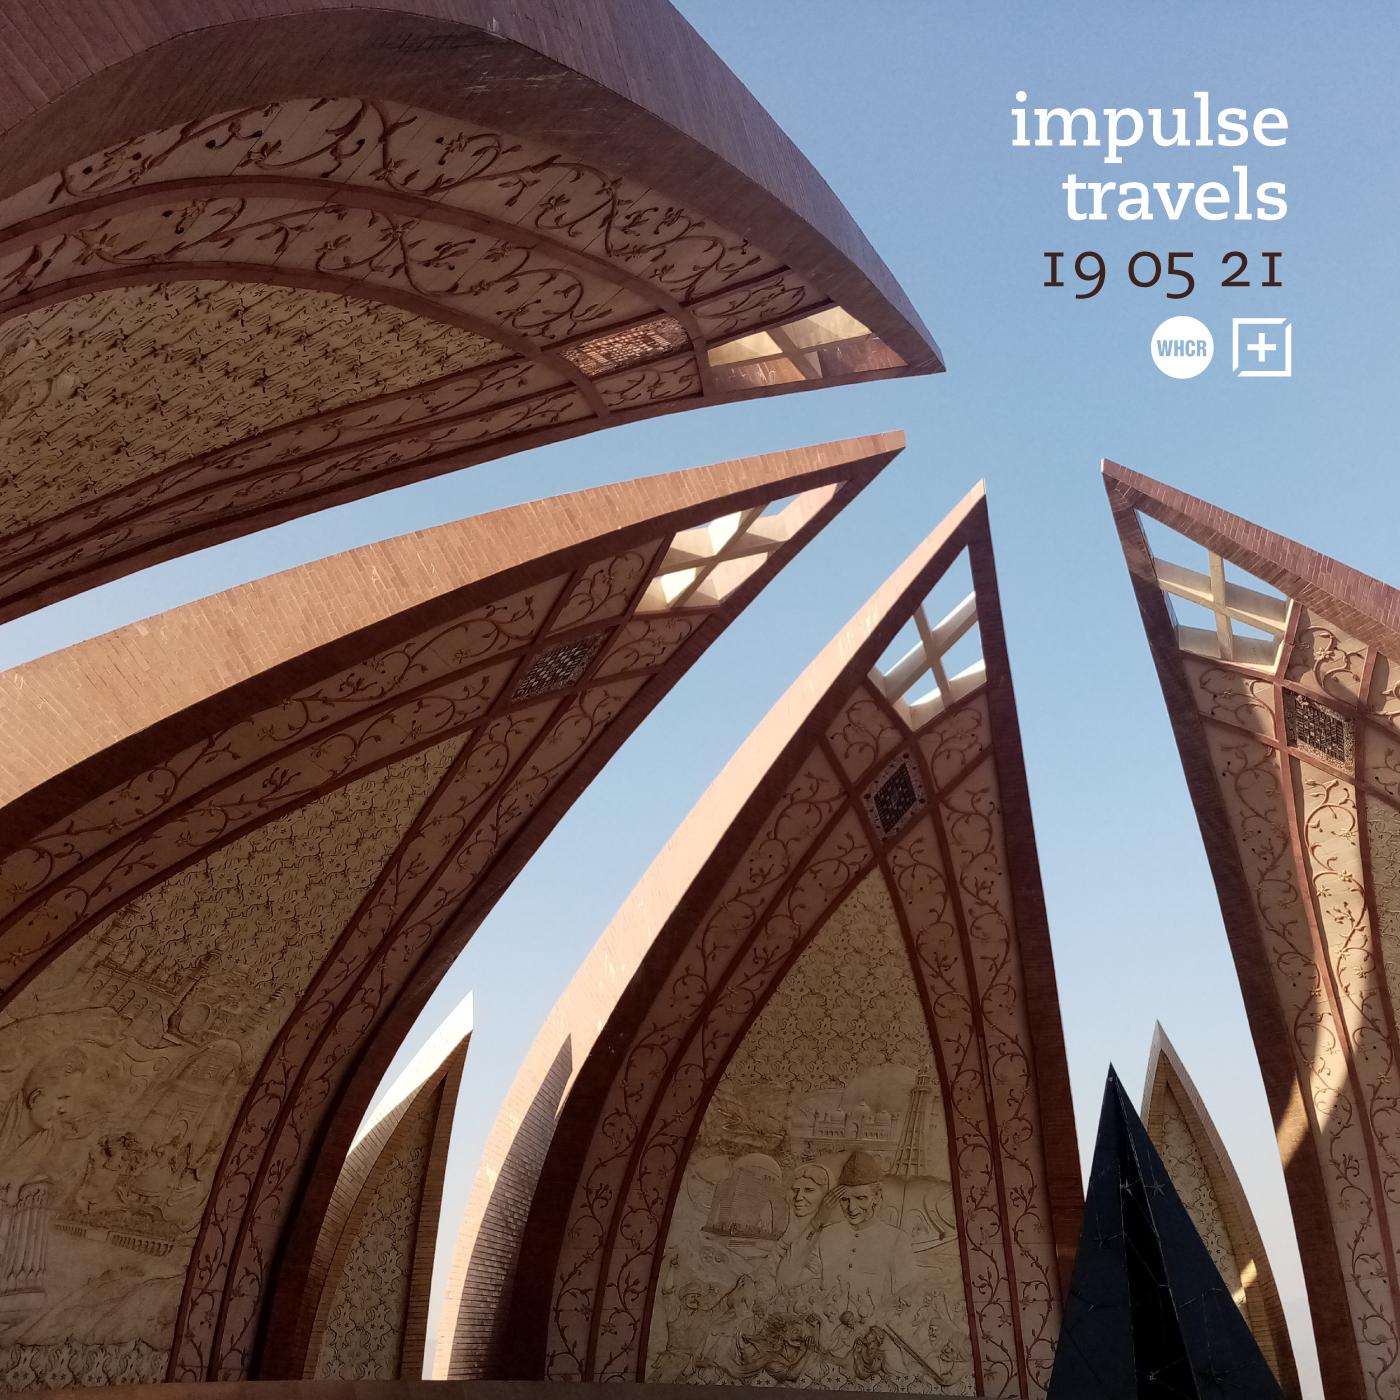 impulse travels radio show w/ dj lil tiger + empanadamn